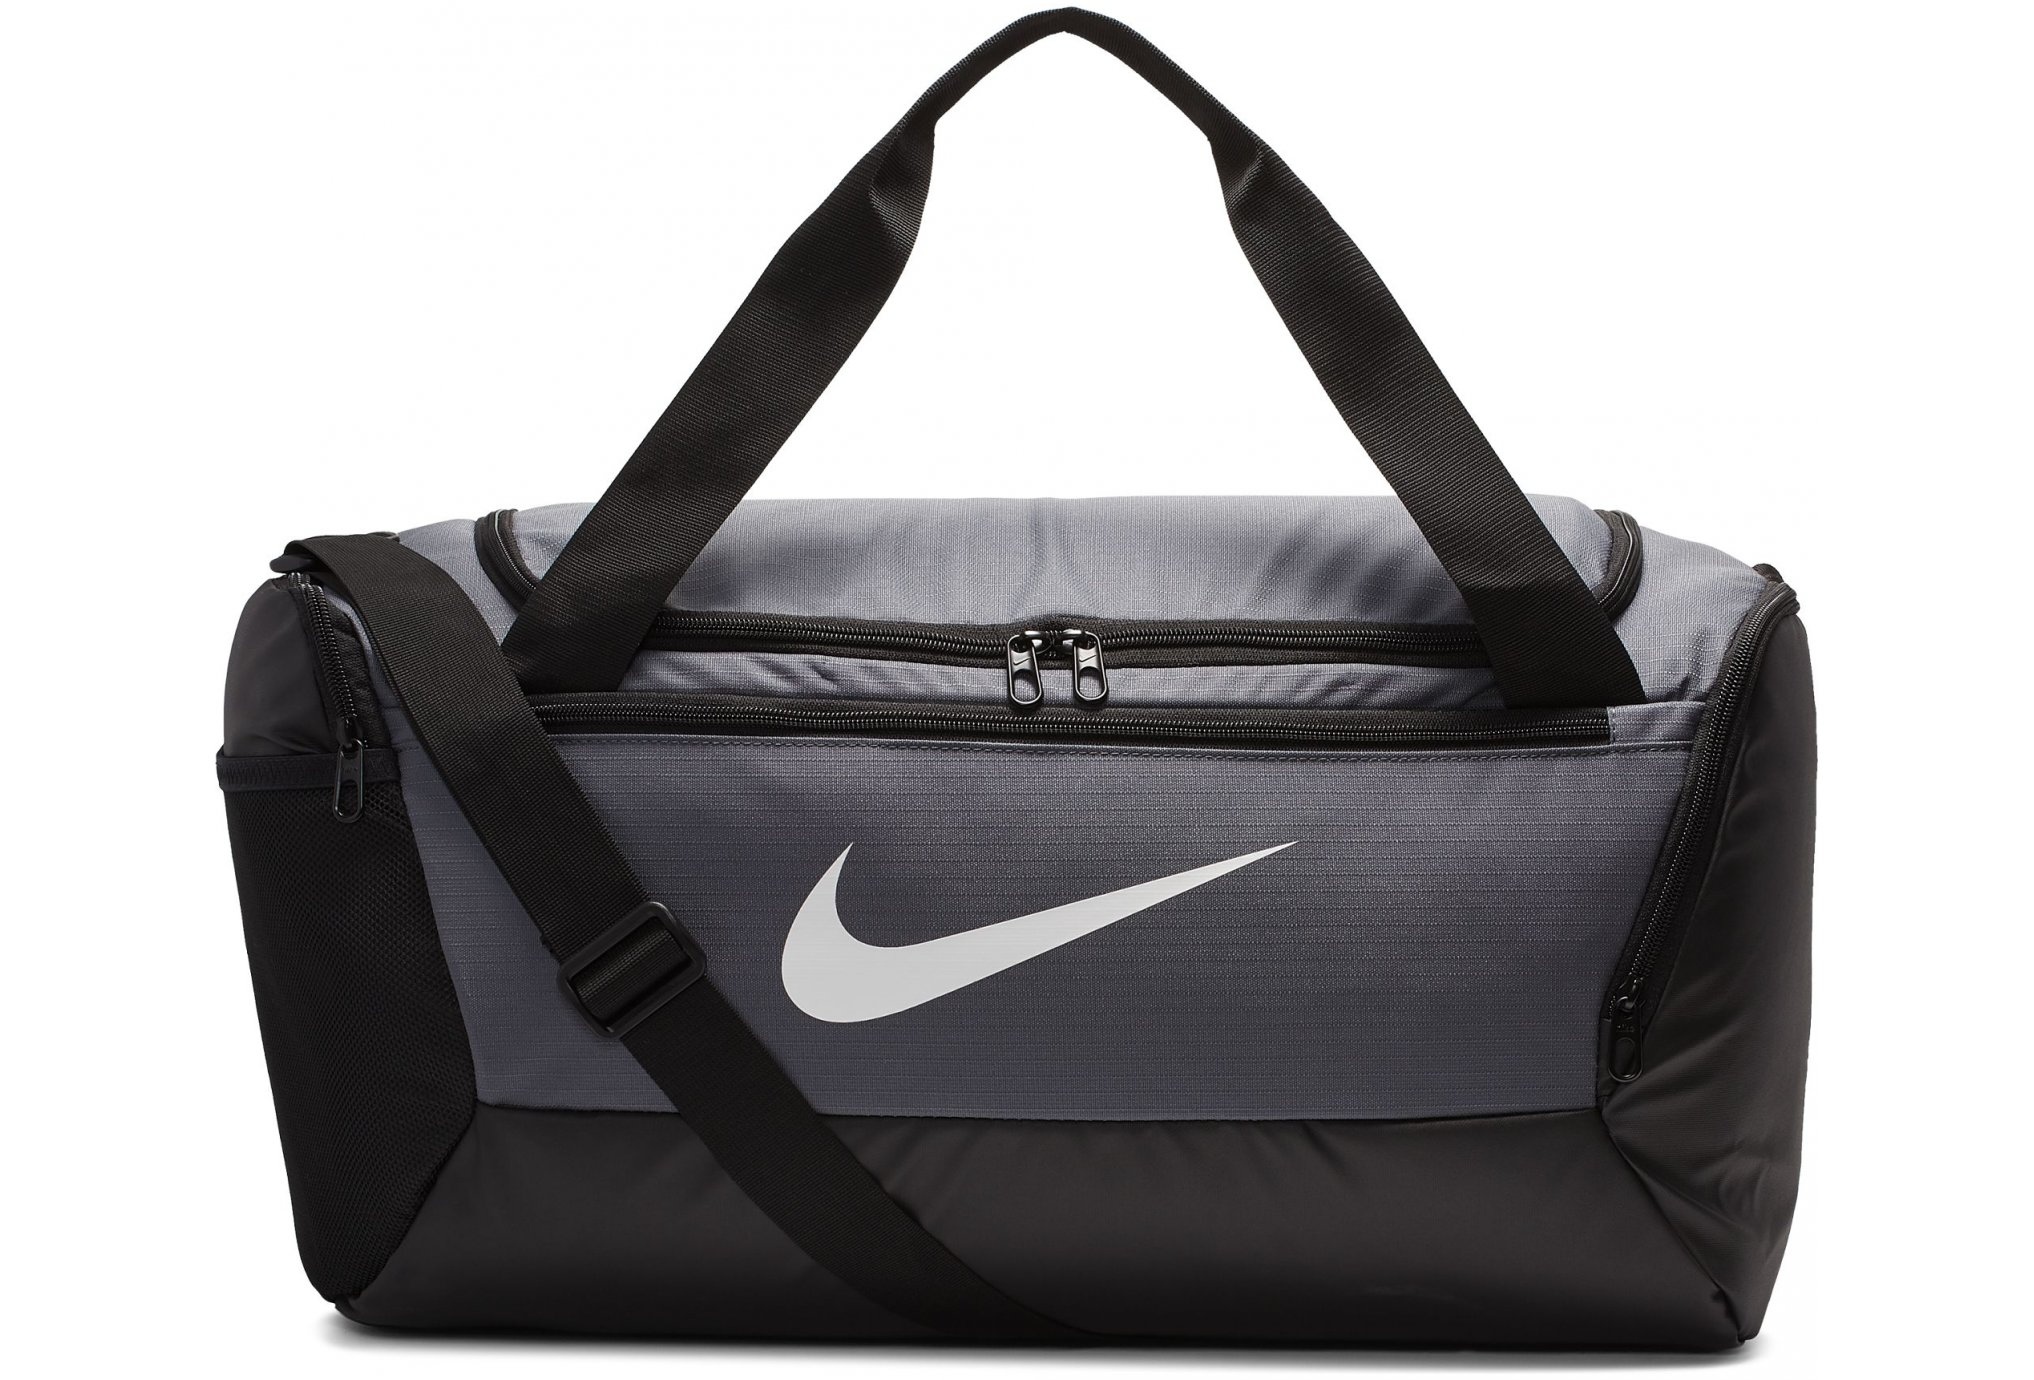 Nike Brasilia duffel 9.0 - s sac de sport